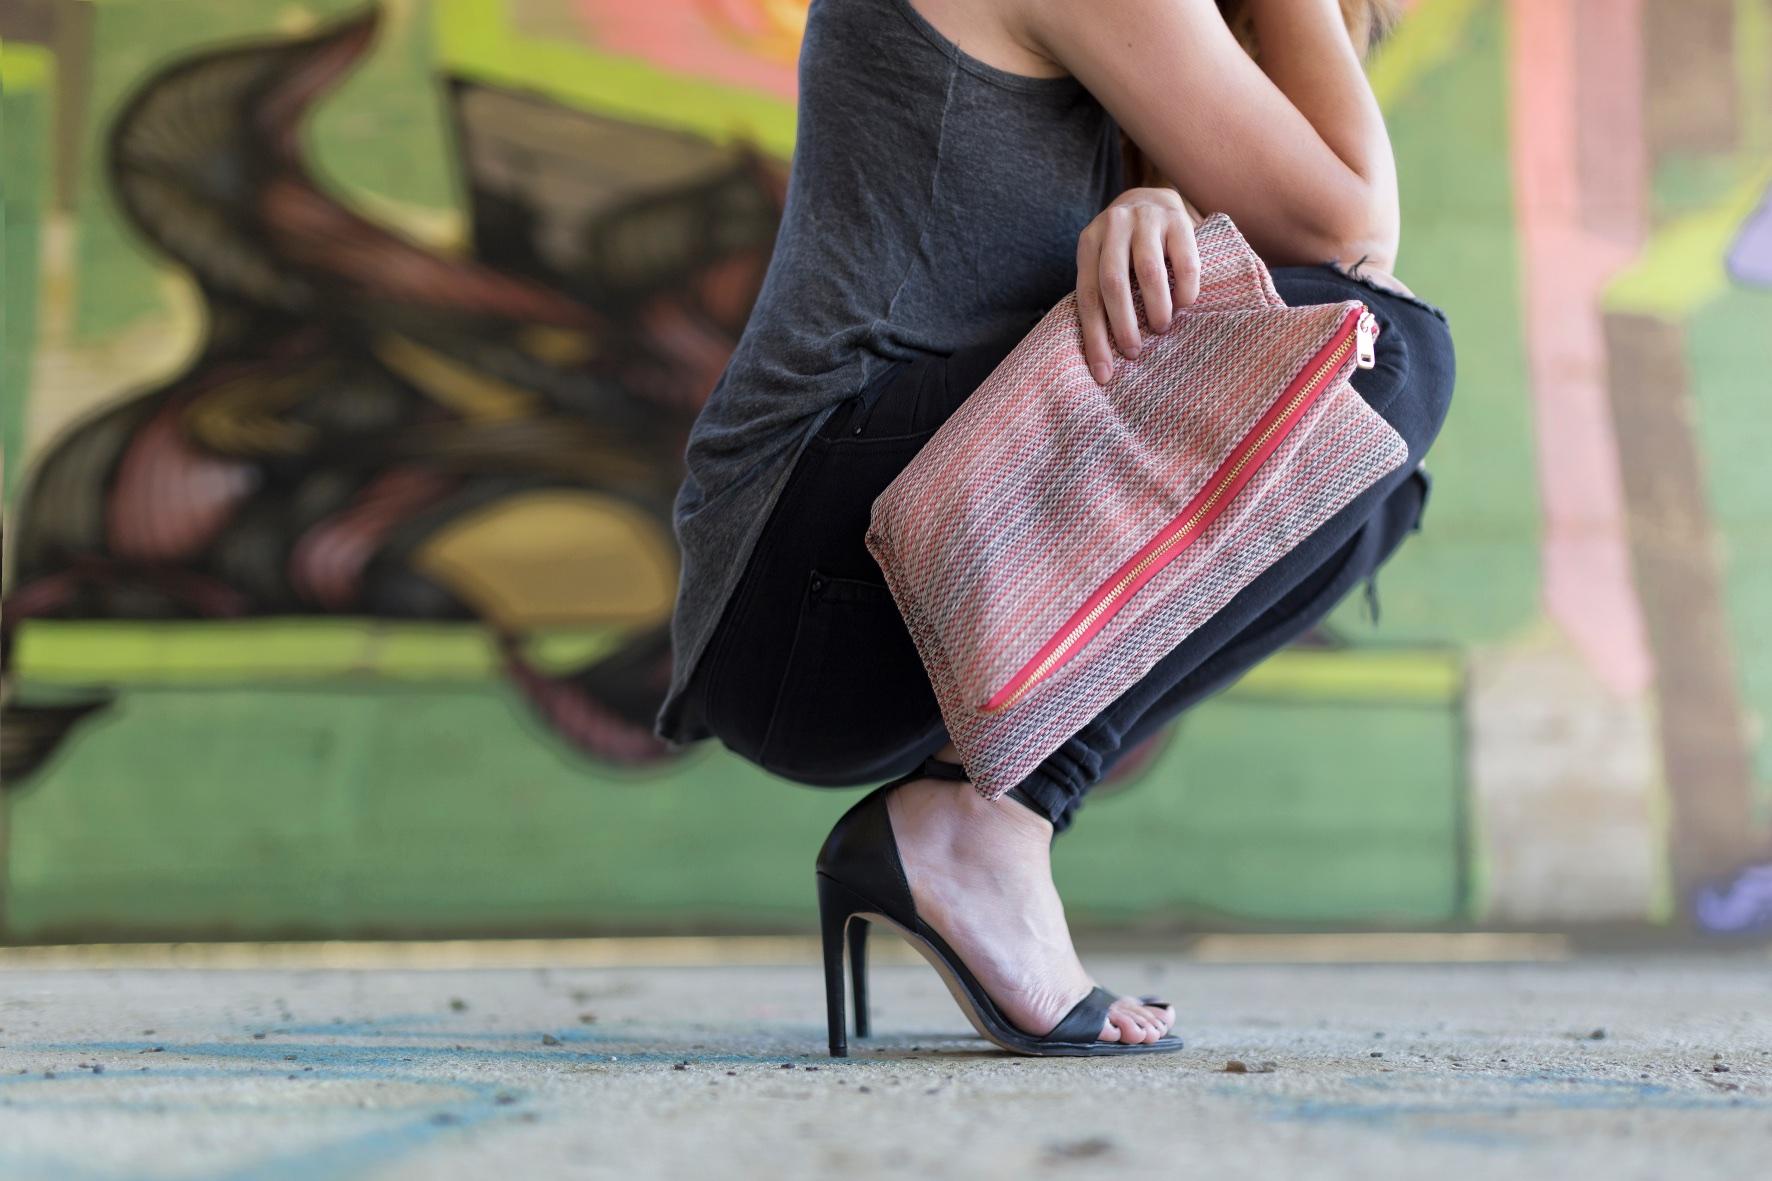 zara -sandals-streetstyle-fashion-blogger-descalzaporelparque-EN LAS NUBES BOLSOS-Divina Comedia